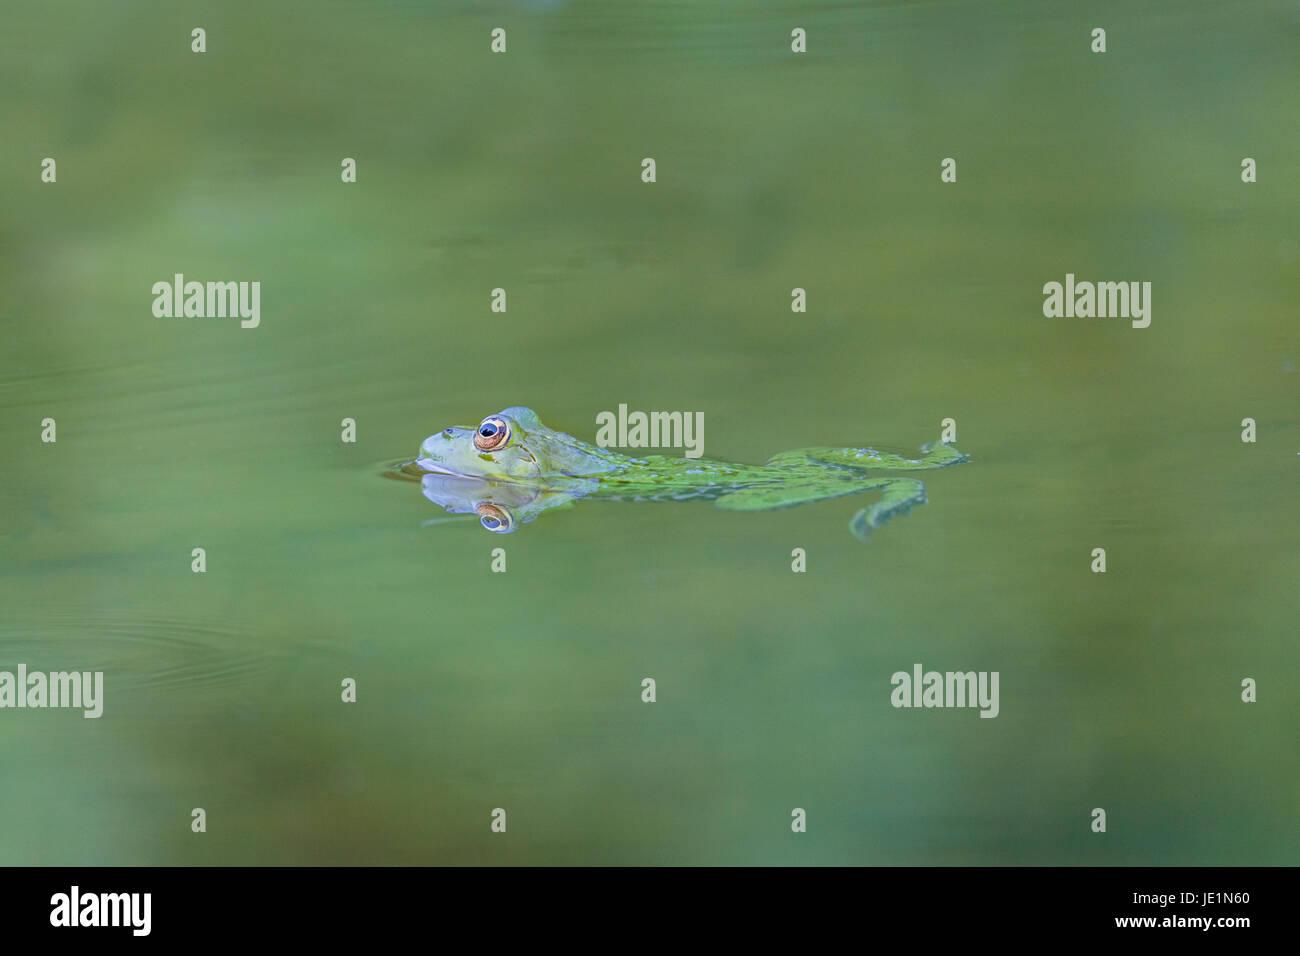 natural reflected green frog (Rana esculenta) swimming in green water - Stock Image